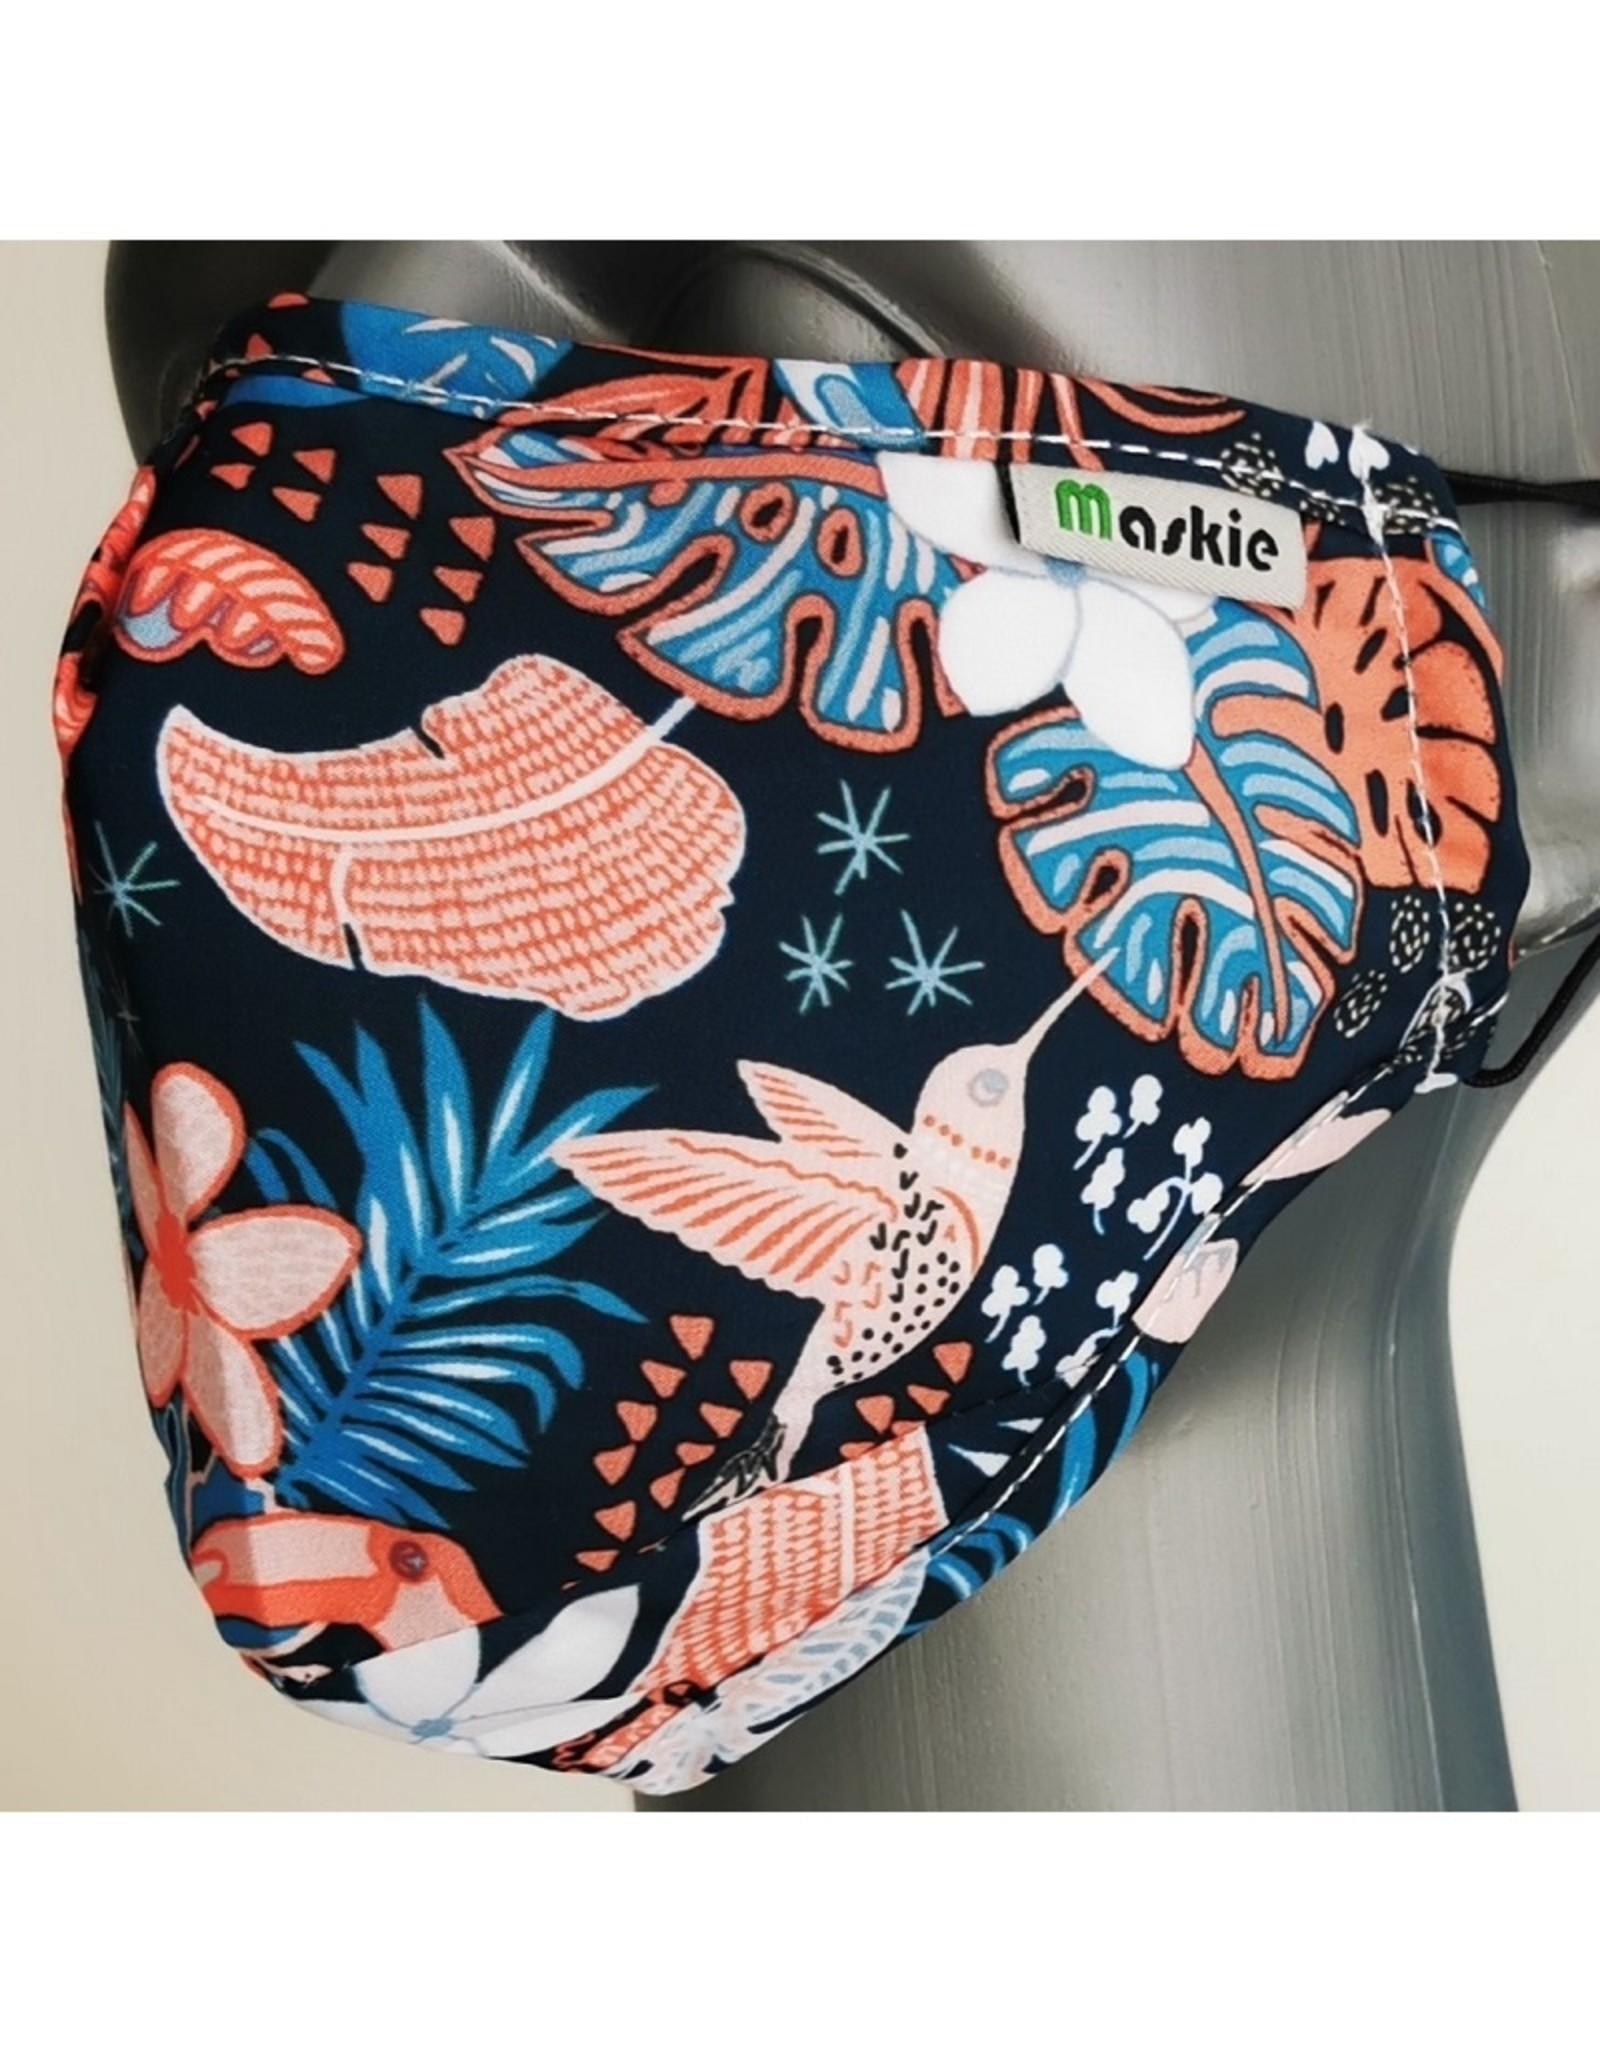 Maskie mask: Jungle Birds